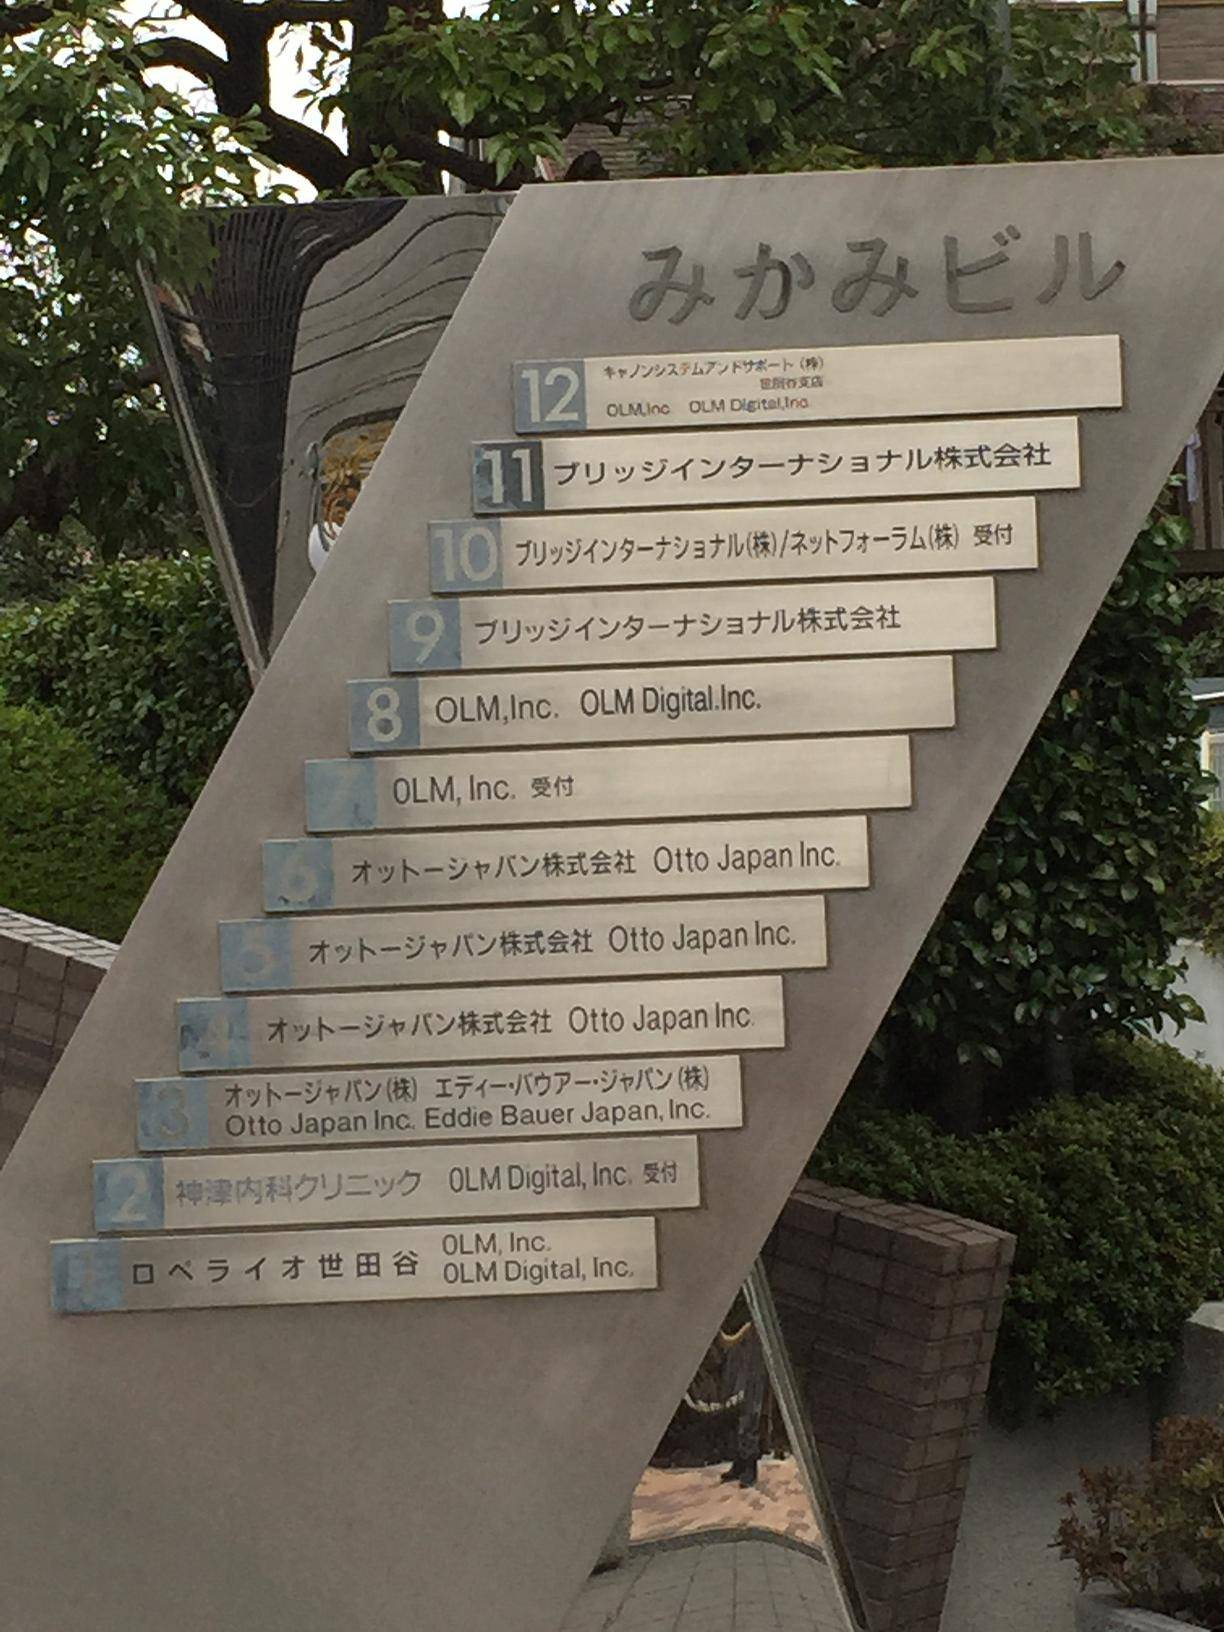 Rencontre francais a tokyo